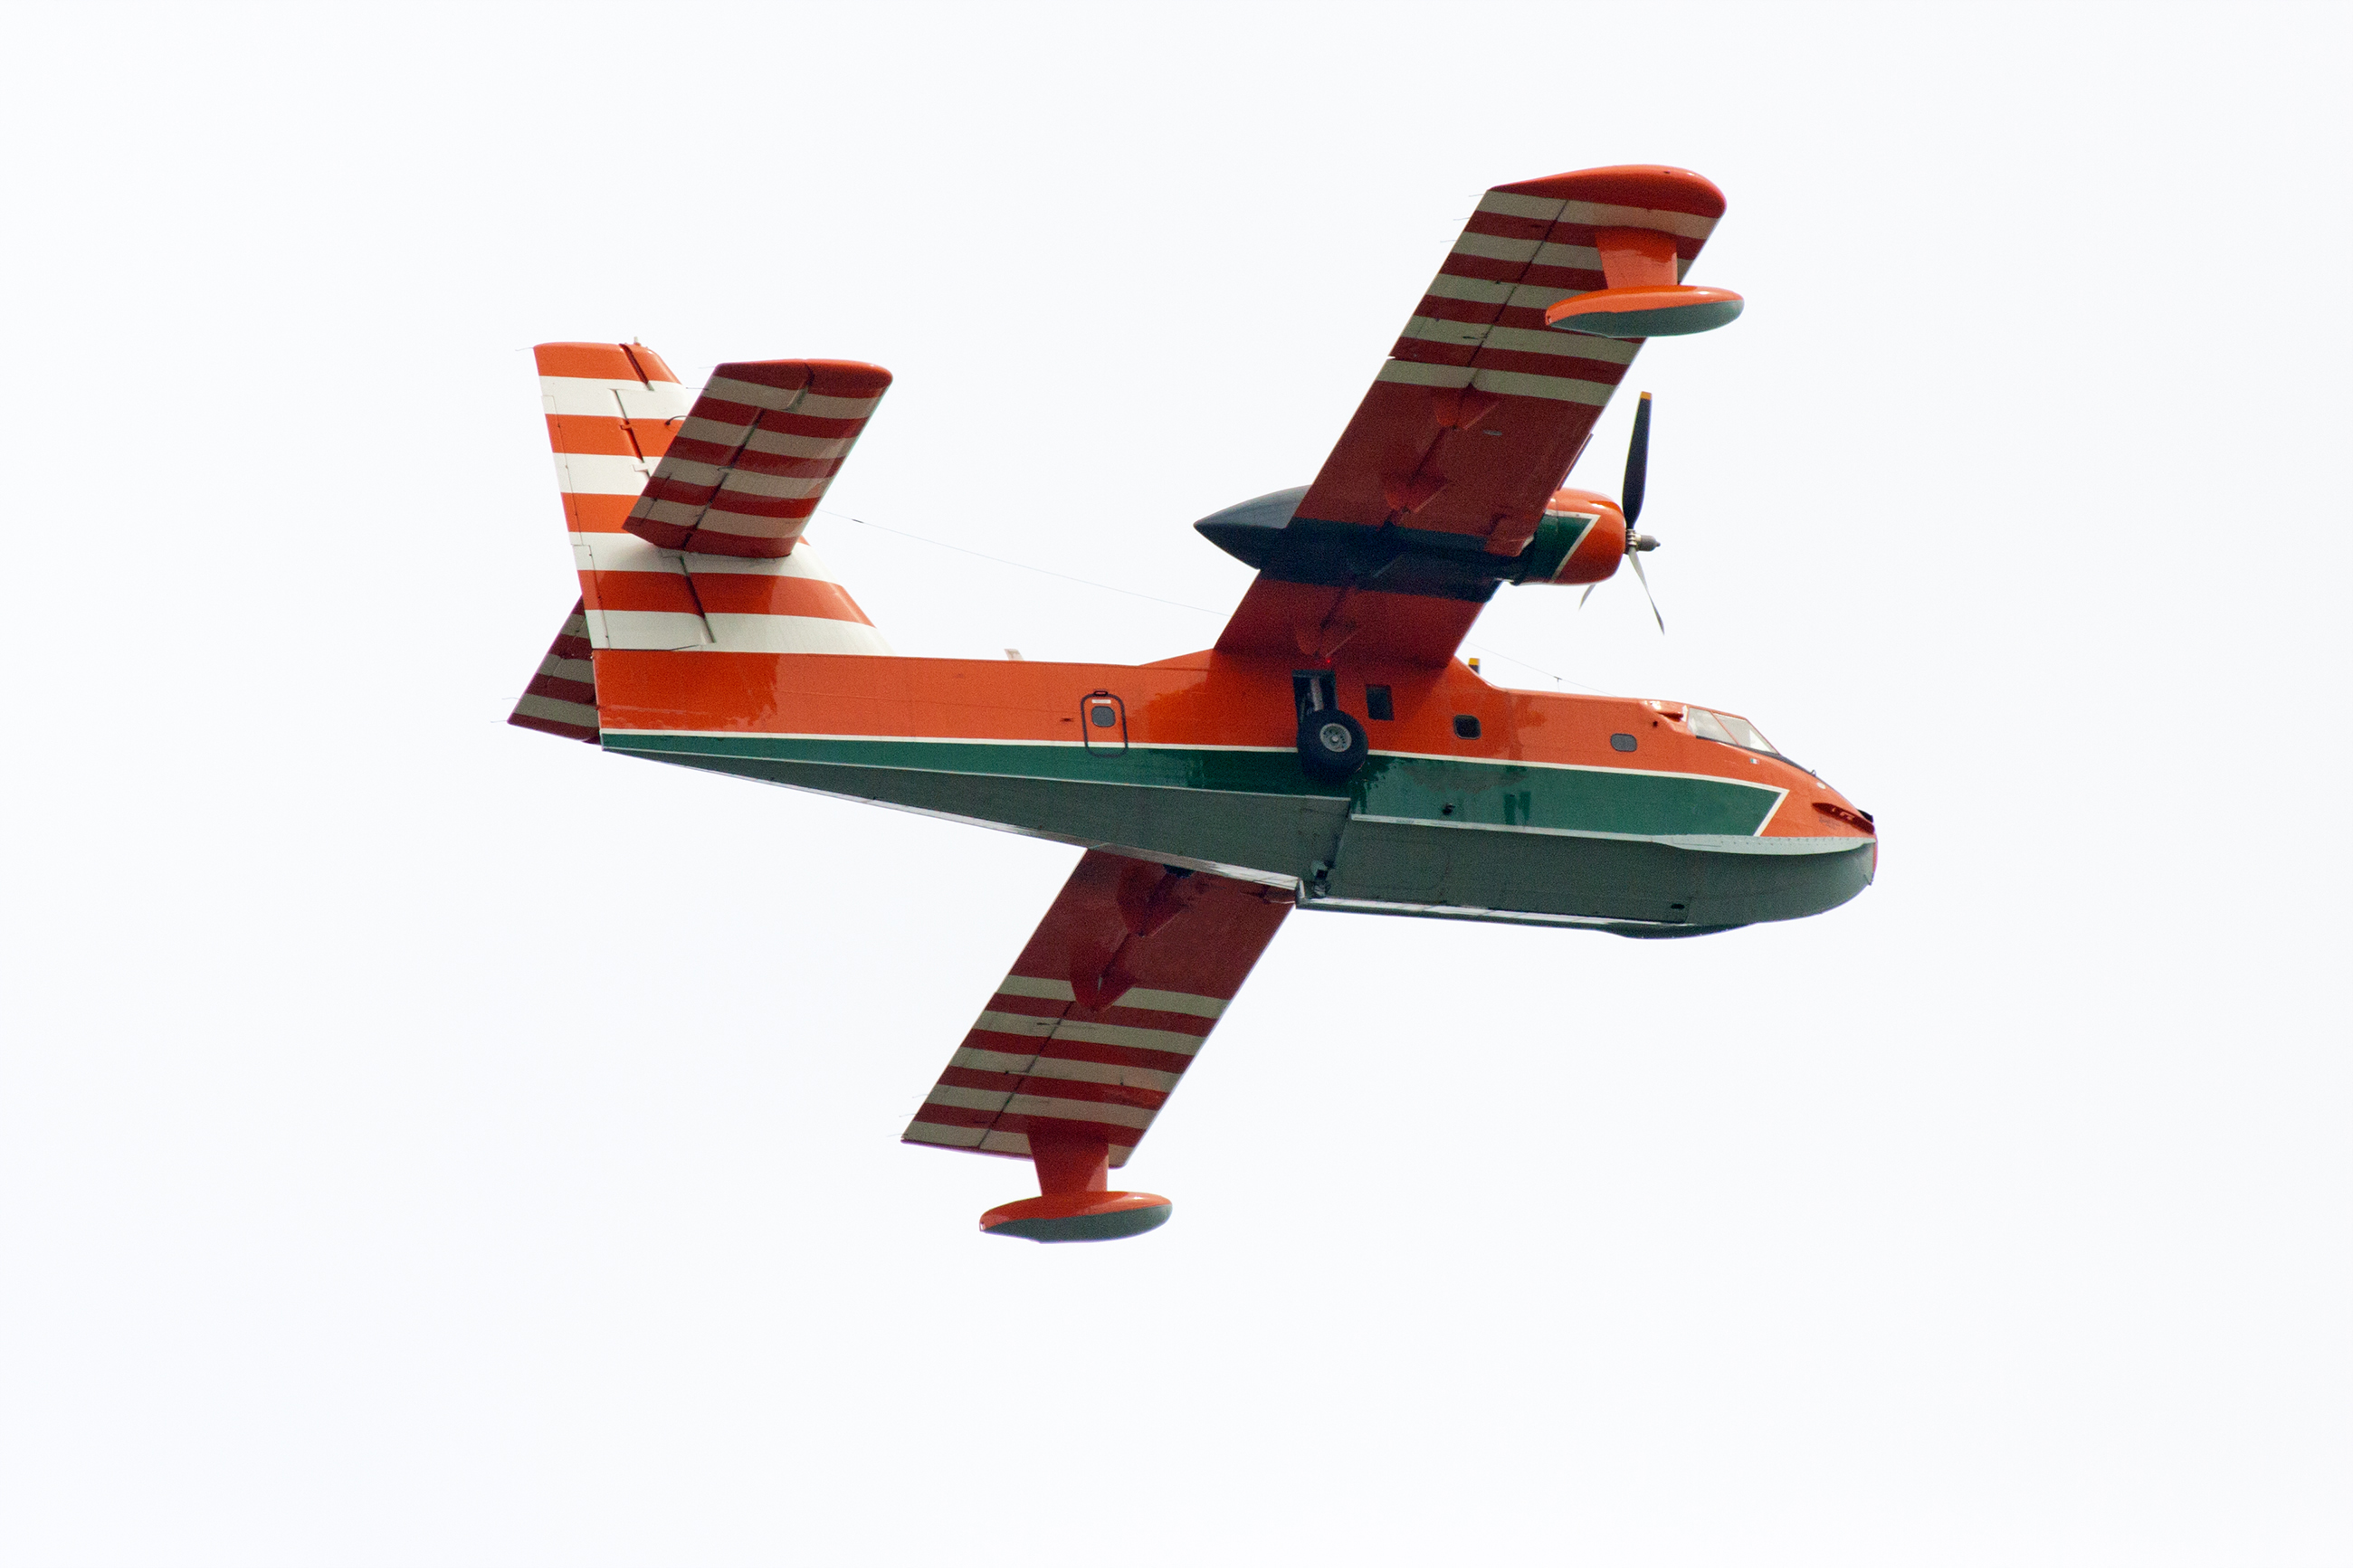 Water bomber, Aeroplane, Disaster, Sky, Propeller, HQ Photo